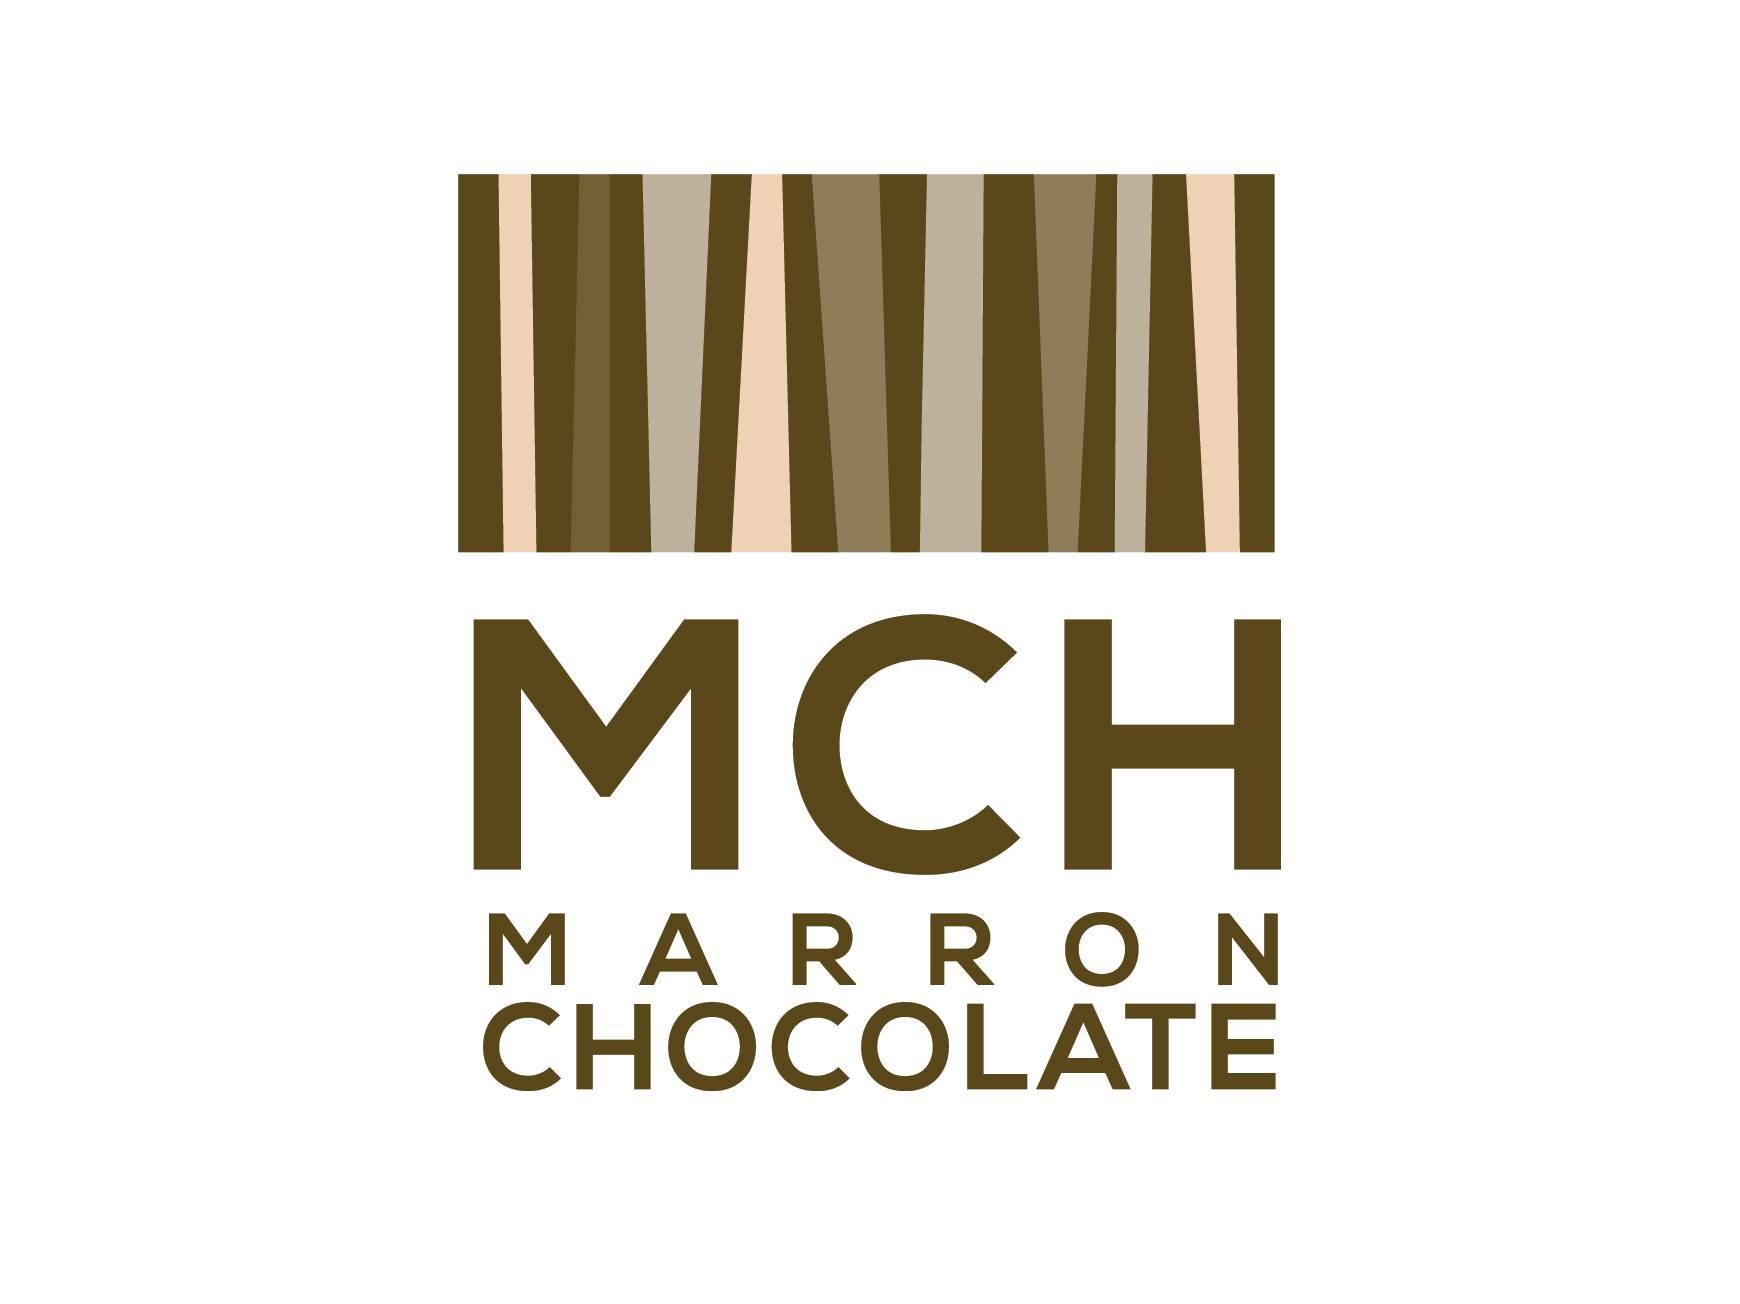 Marrón Chocolate